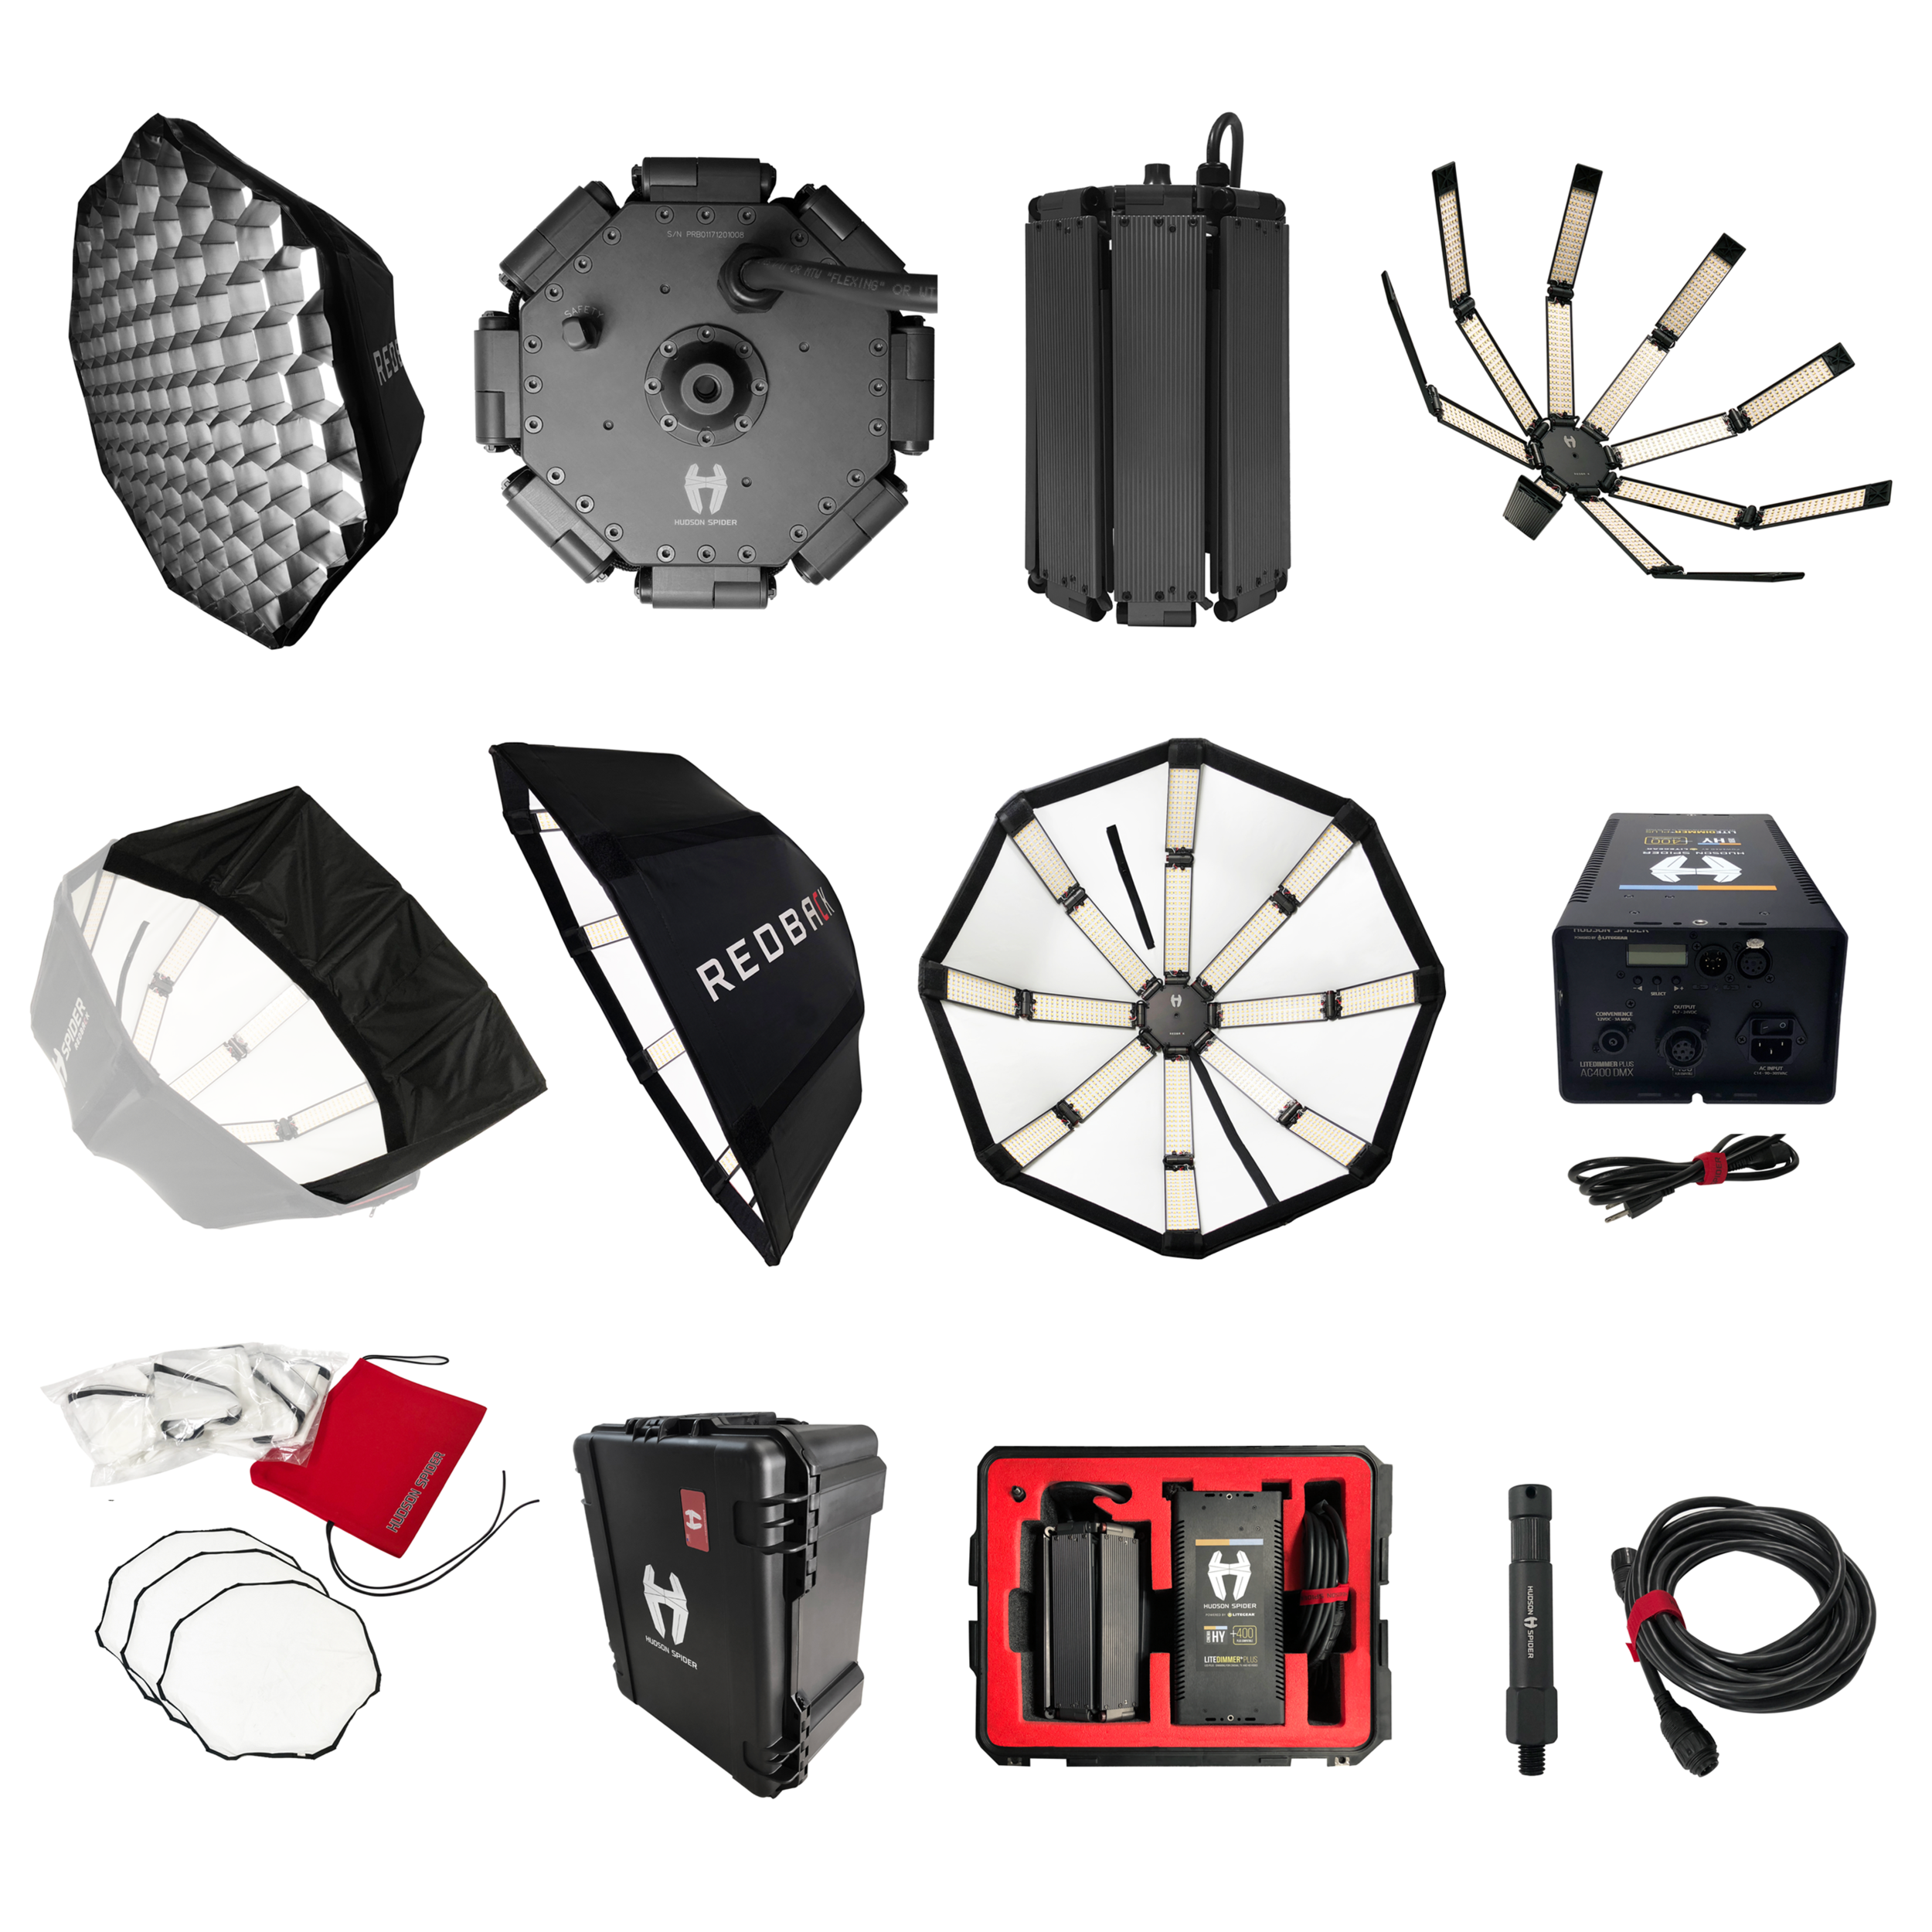 REdbback deluxe kit.png